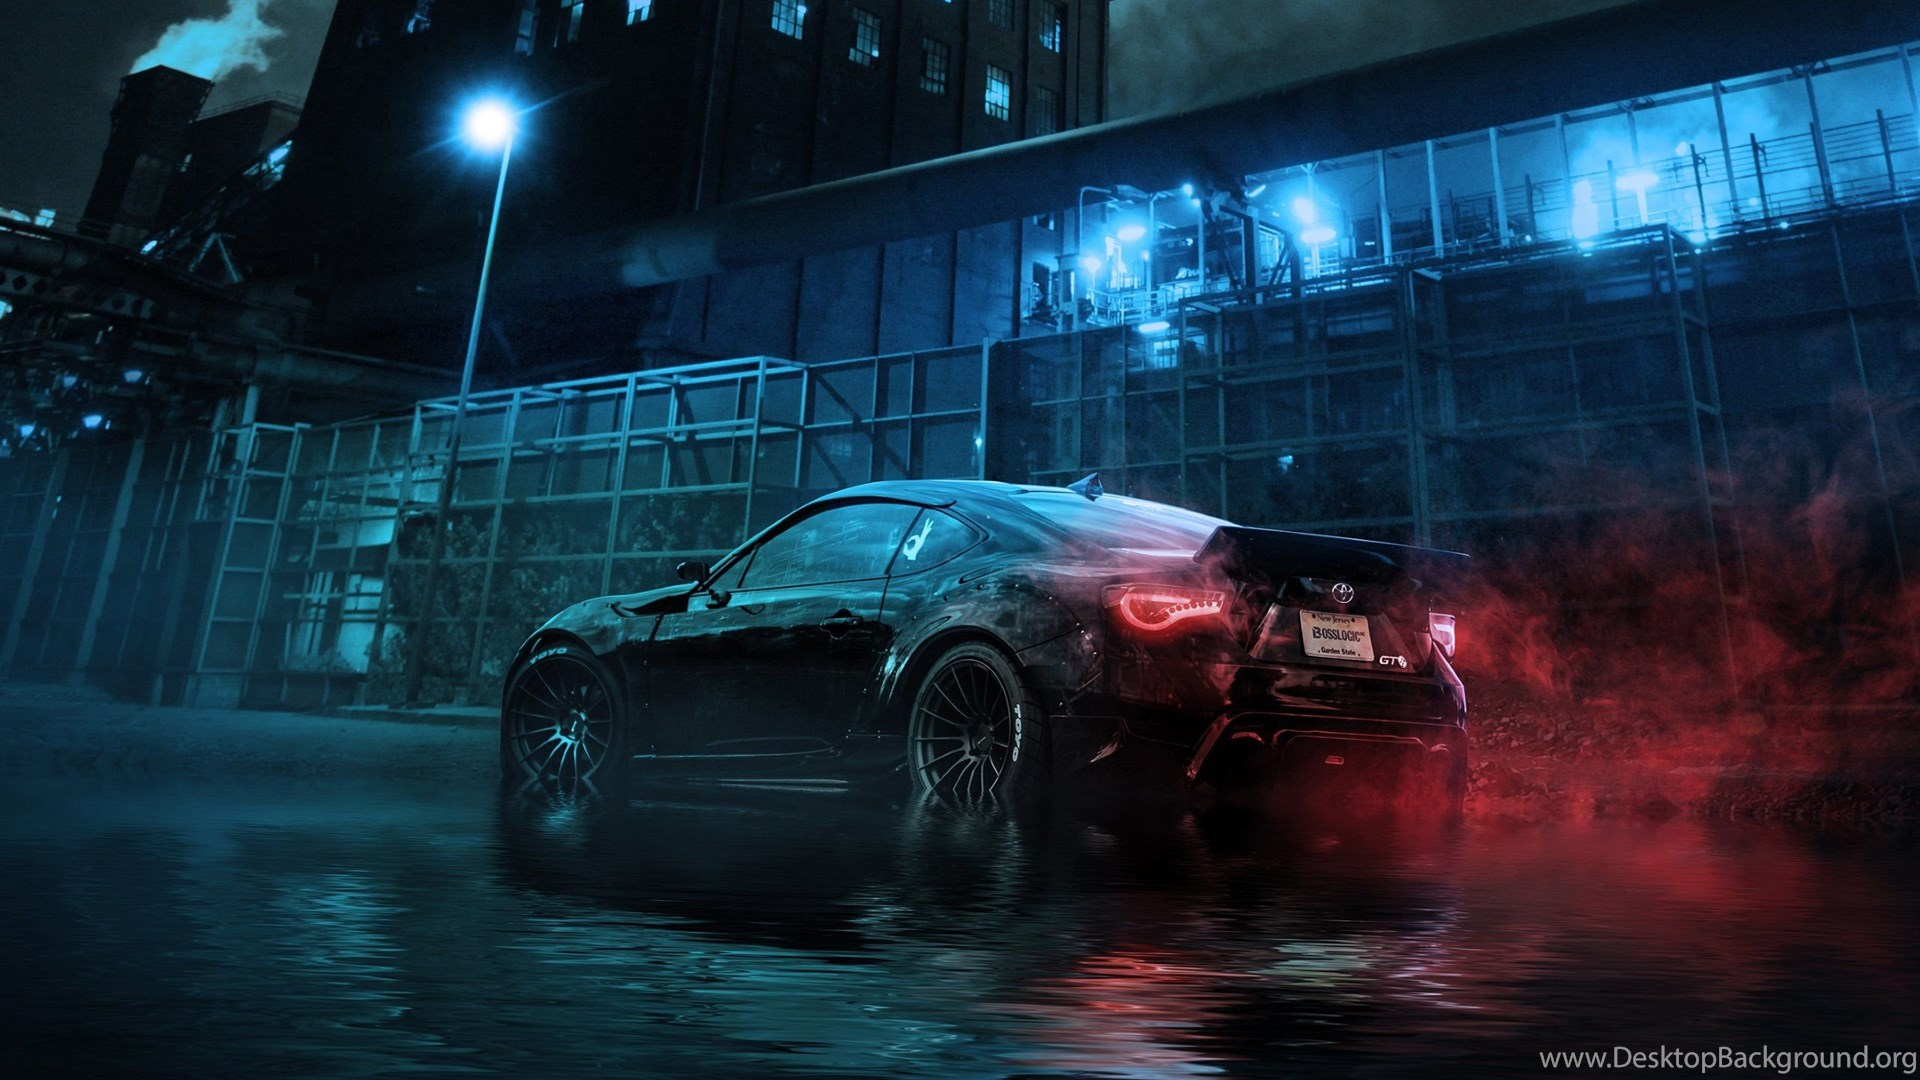 Toyota Gt Super Art Car Wallpapers Hd Wallpapers Desktop Background